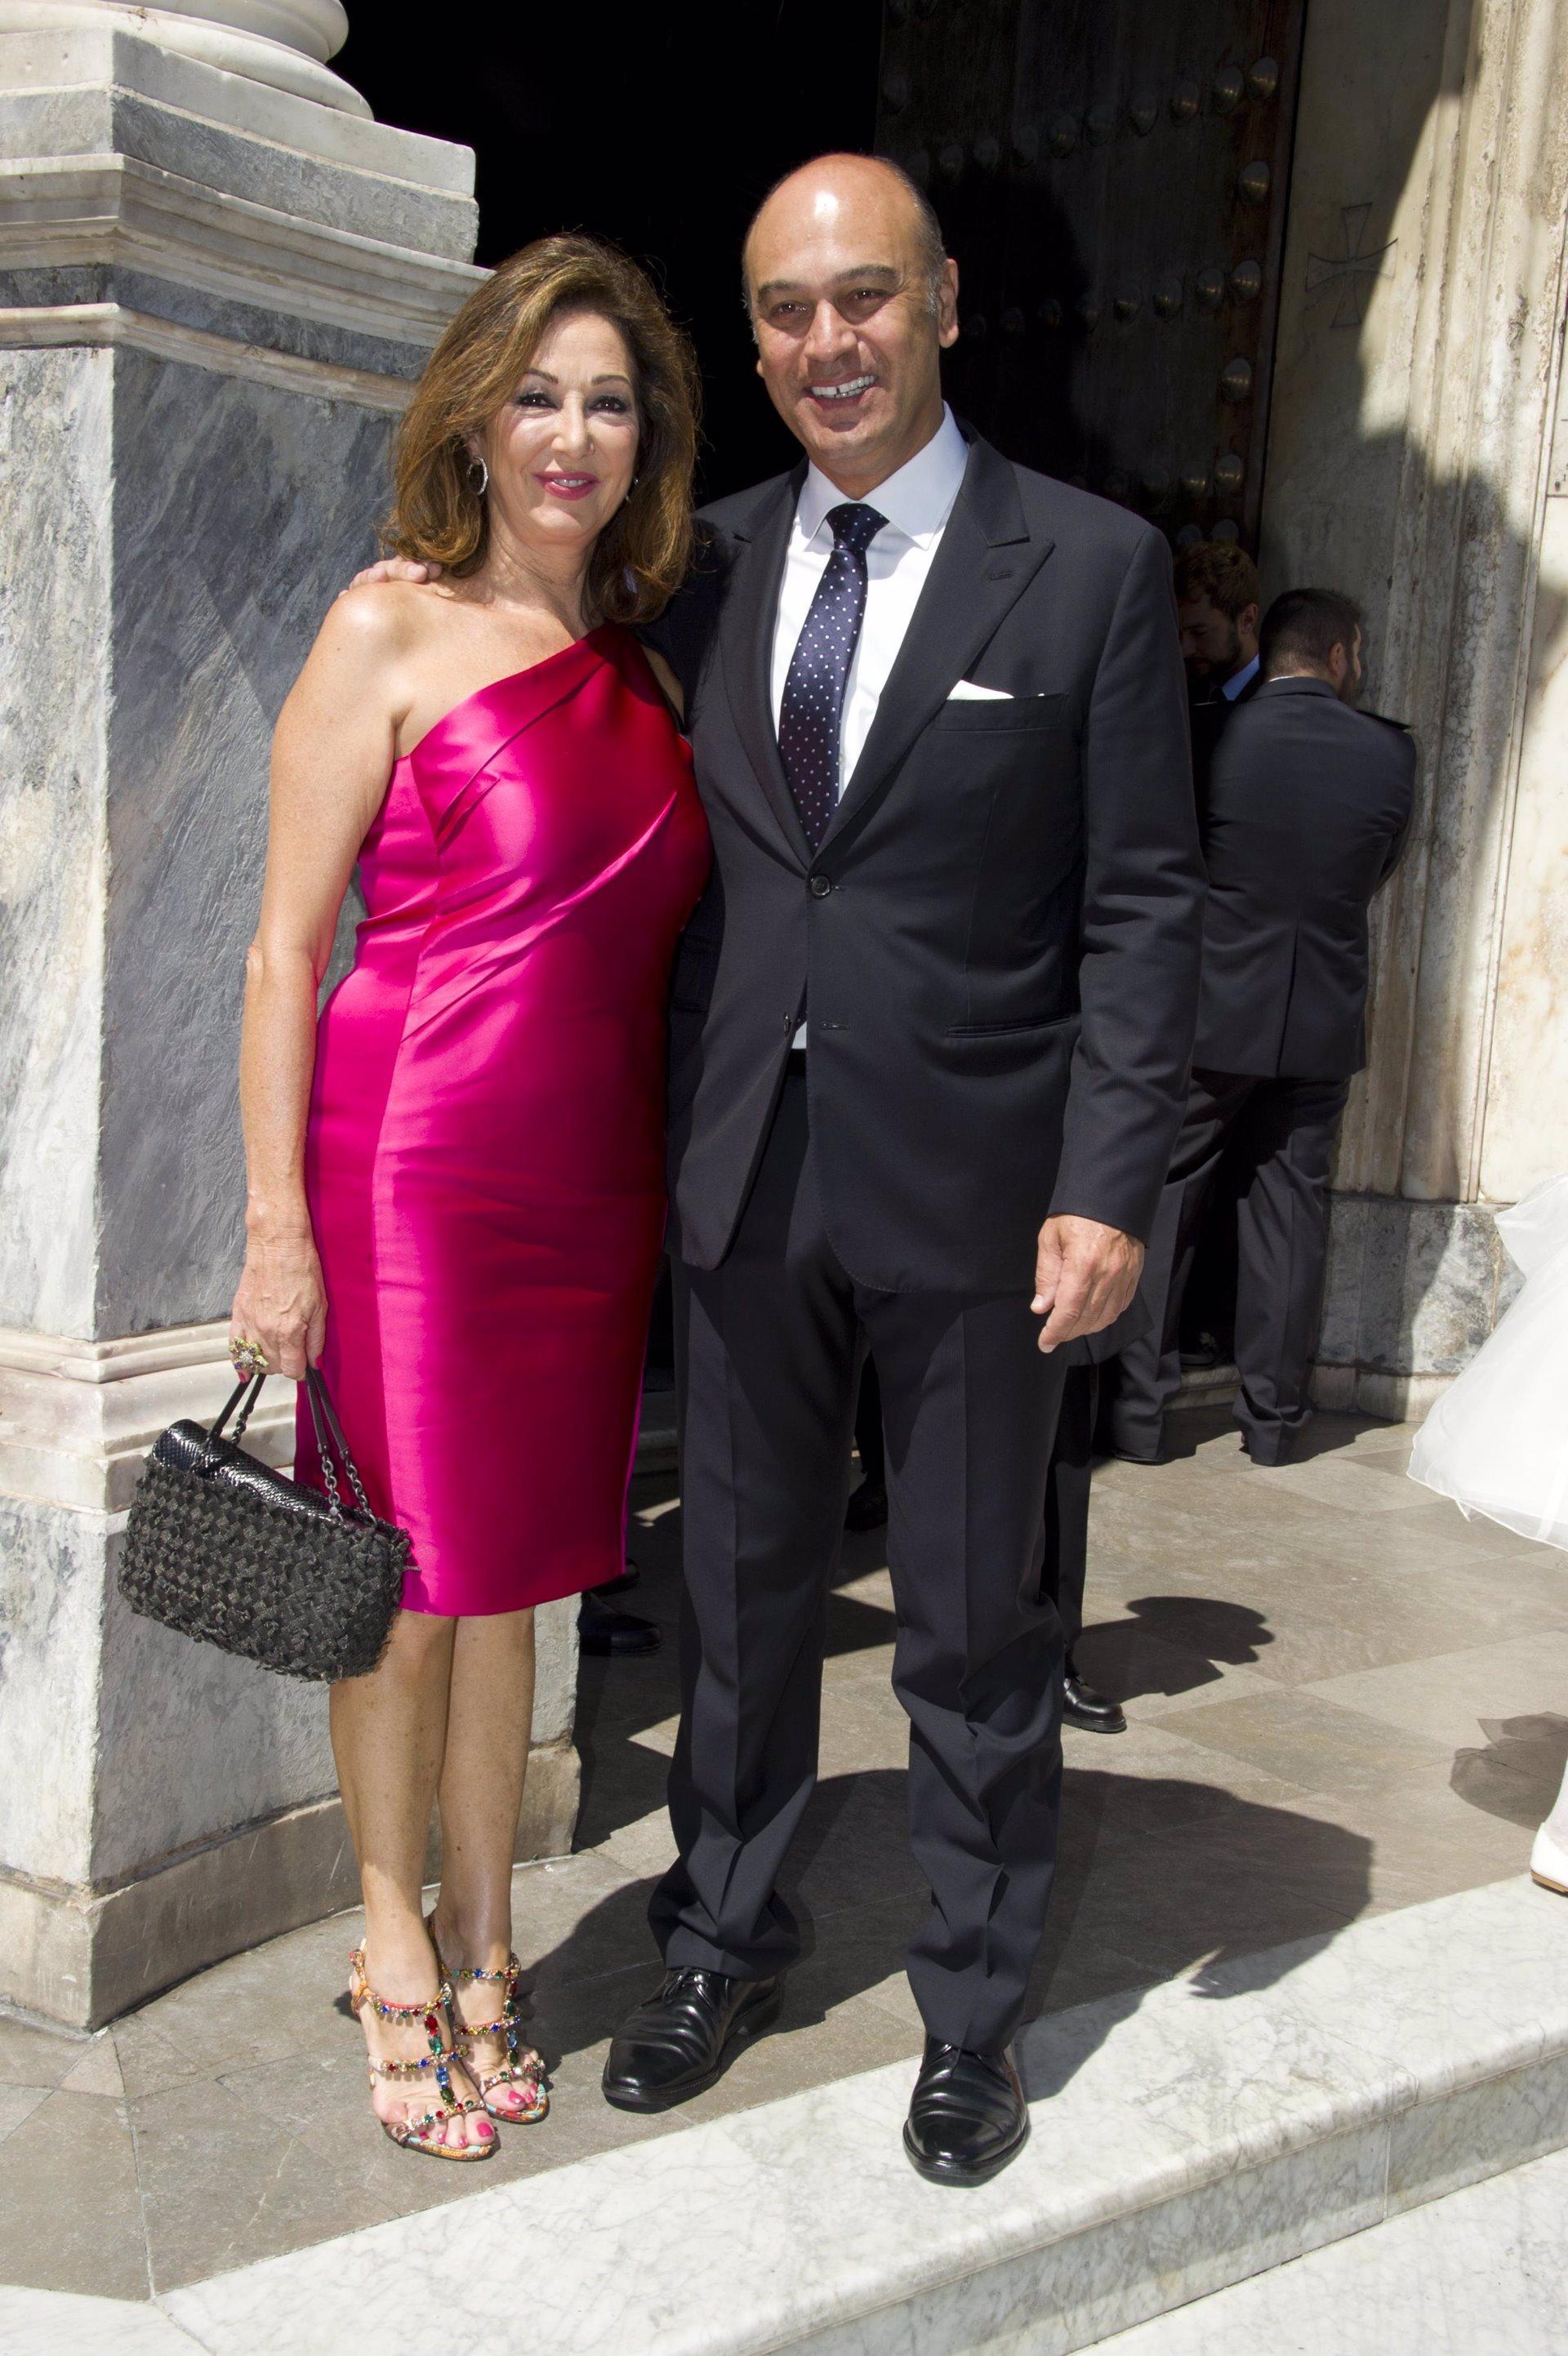 Con Pardo En La Marido Su De Ana Patricia Quintana Boda Rosa DHeW2IYb9E